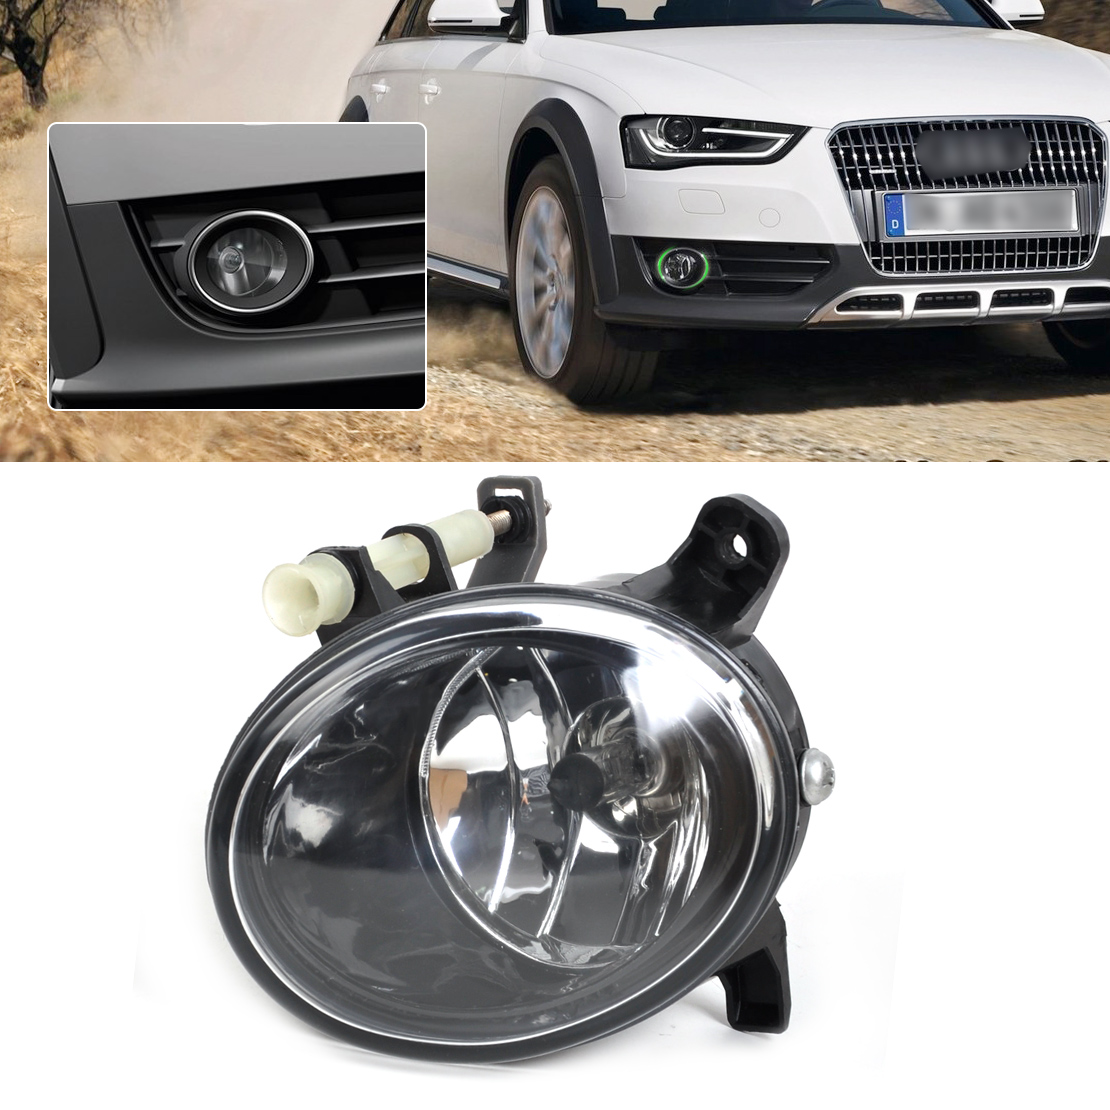 DWCX 8T0941700B Front Right Fog Light Lamp for Audi A4 B8 / S4 / A4 Allroad / A6 C6 / S6 / A5 / S5 / Q5 фары номерного знака candy 5 18 smd audi audi a4 b8 s4 a5 s5 q5 s tt rs